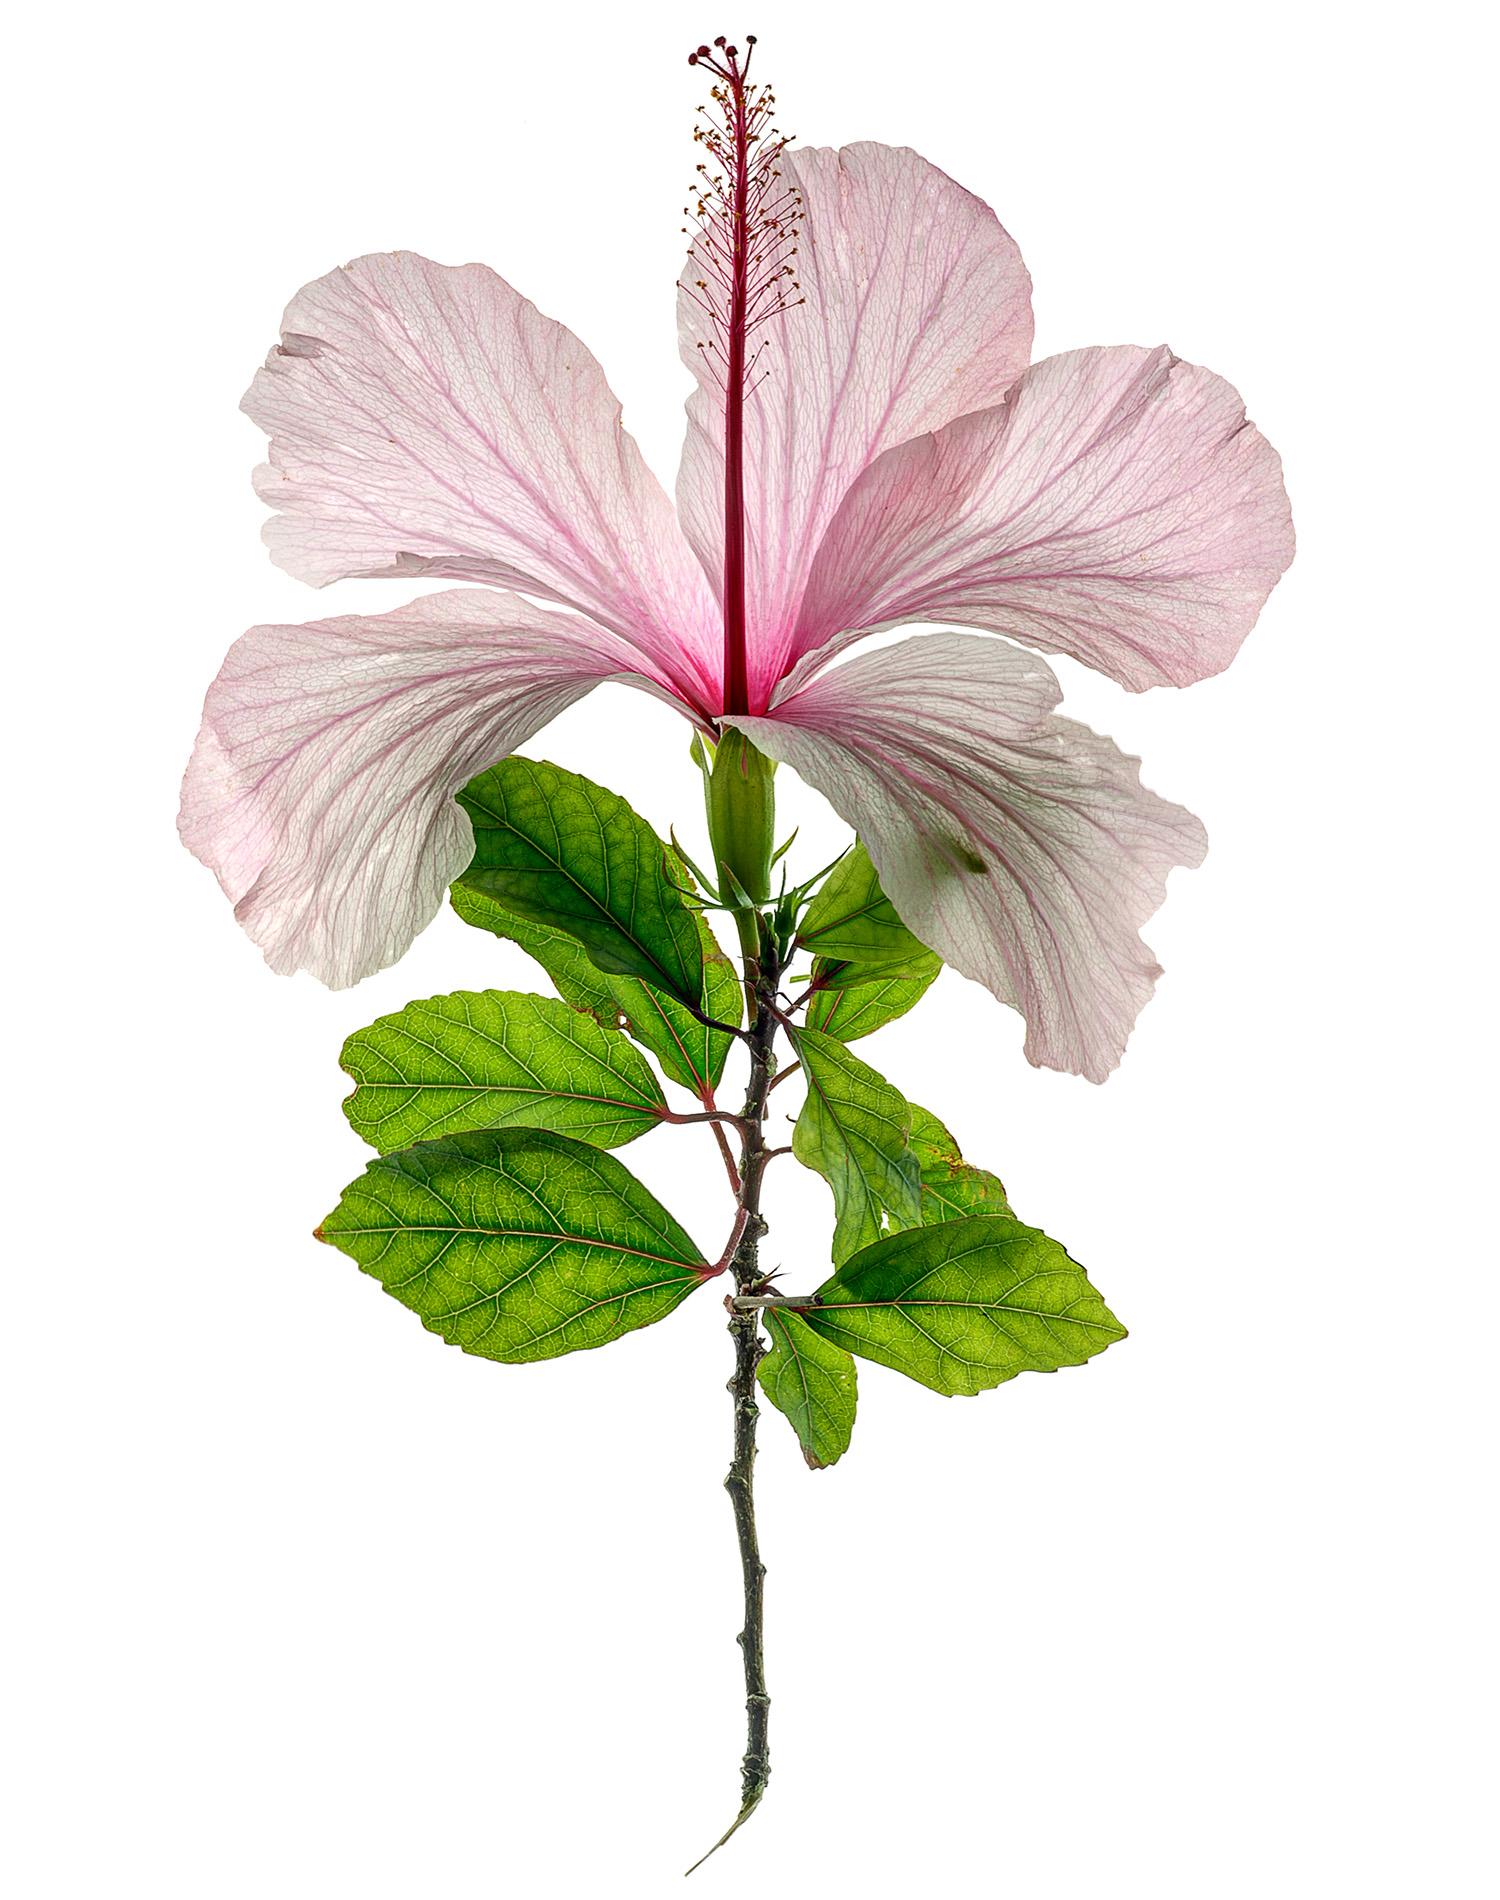 Hibiscus-1900x1500-72dpi-Web.jpg